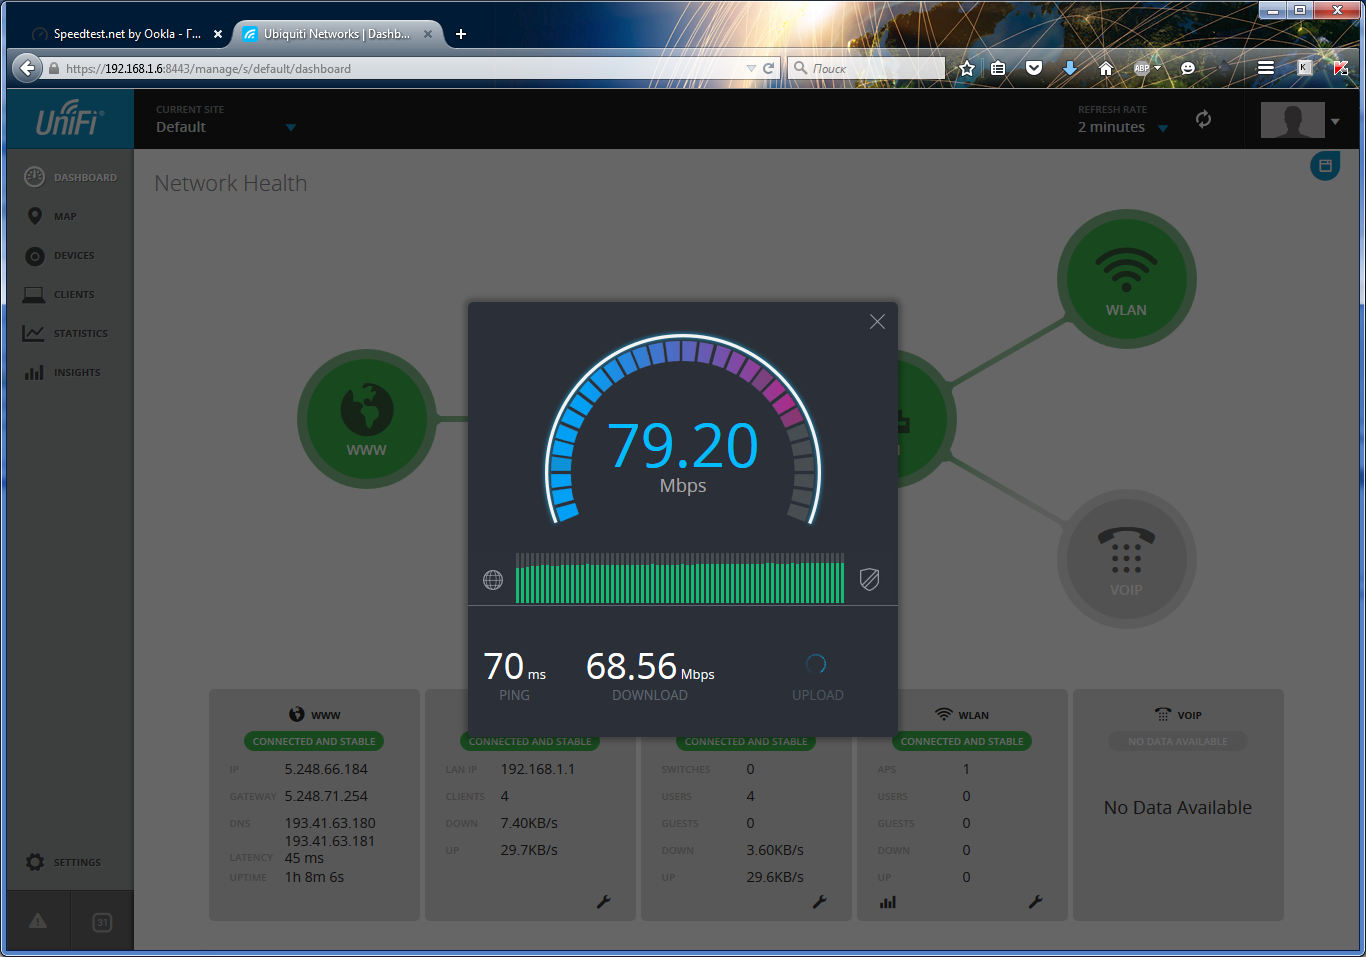 UniFi Controller тест скорости сети